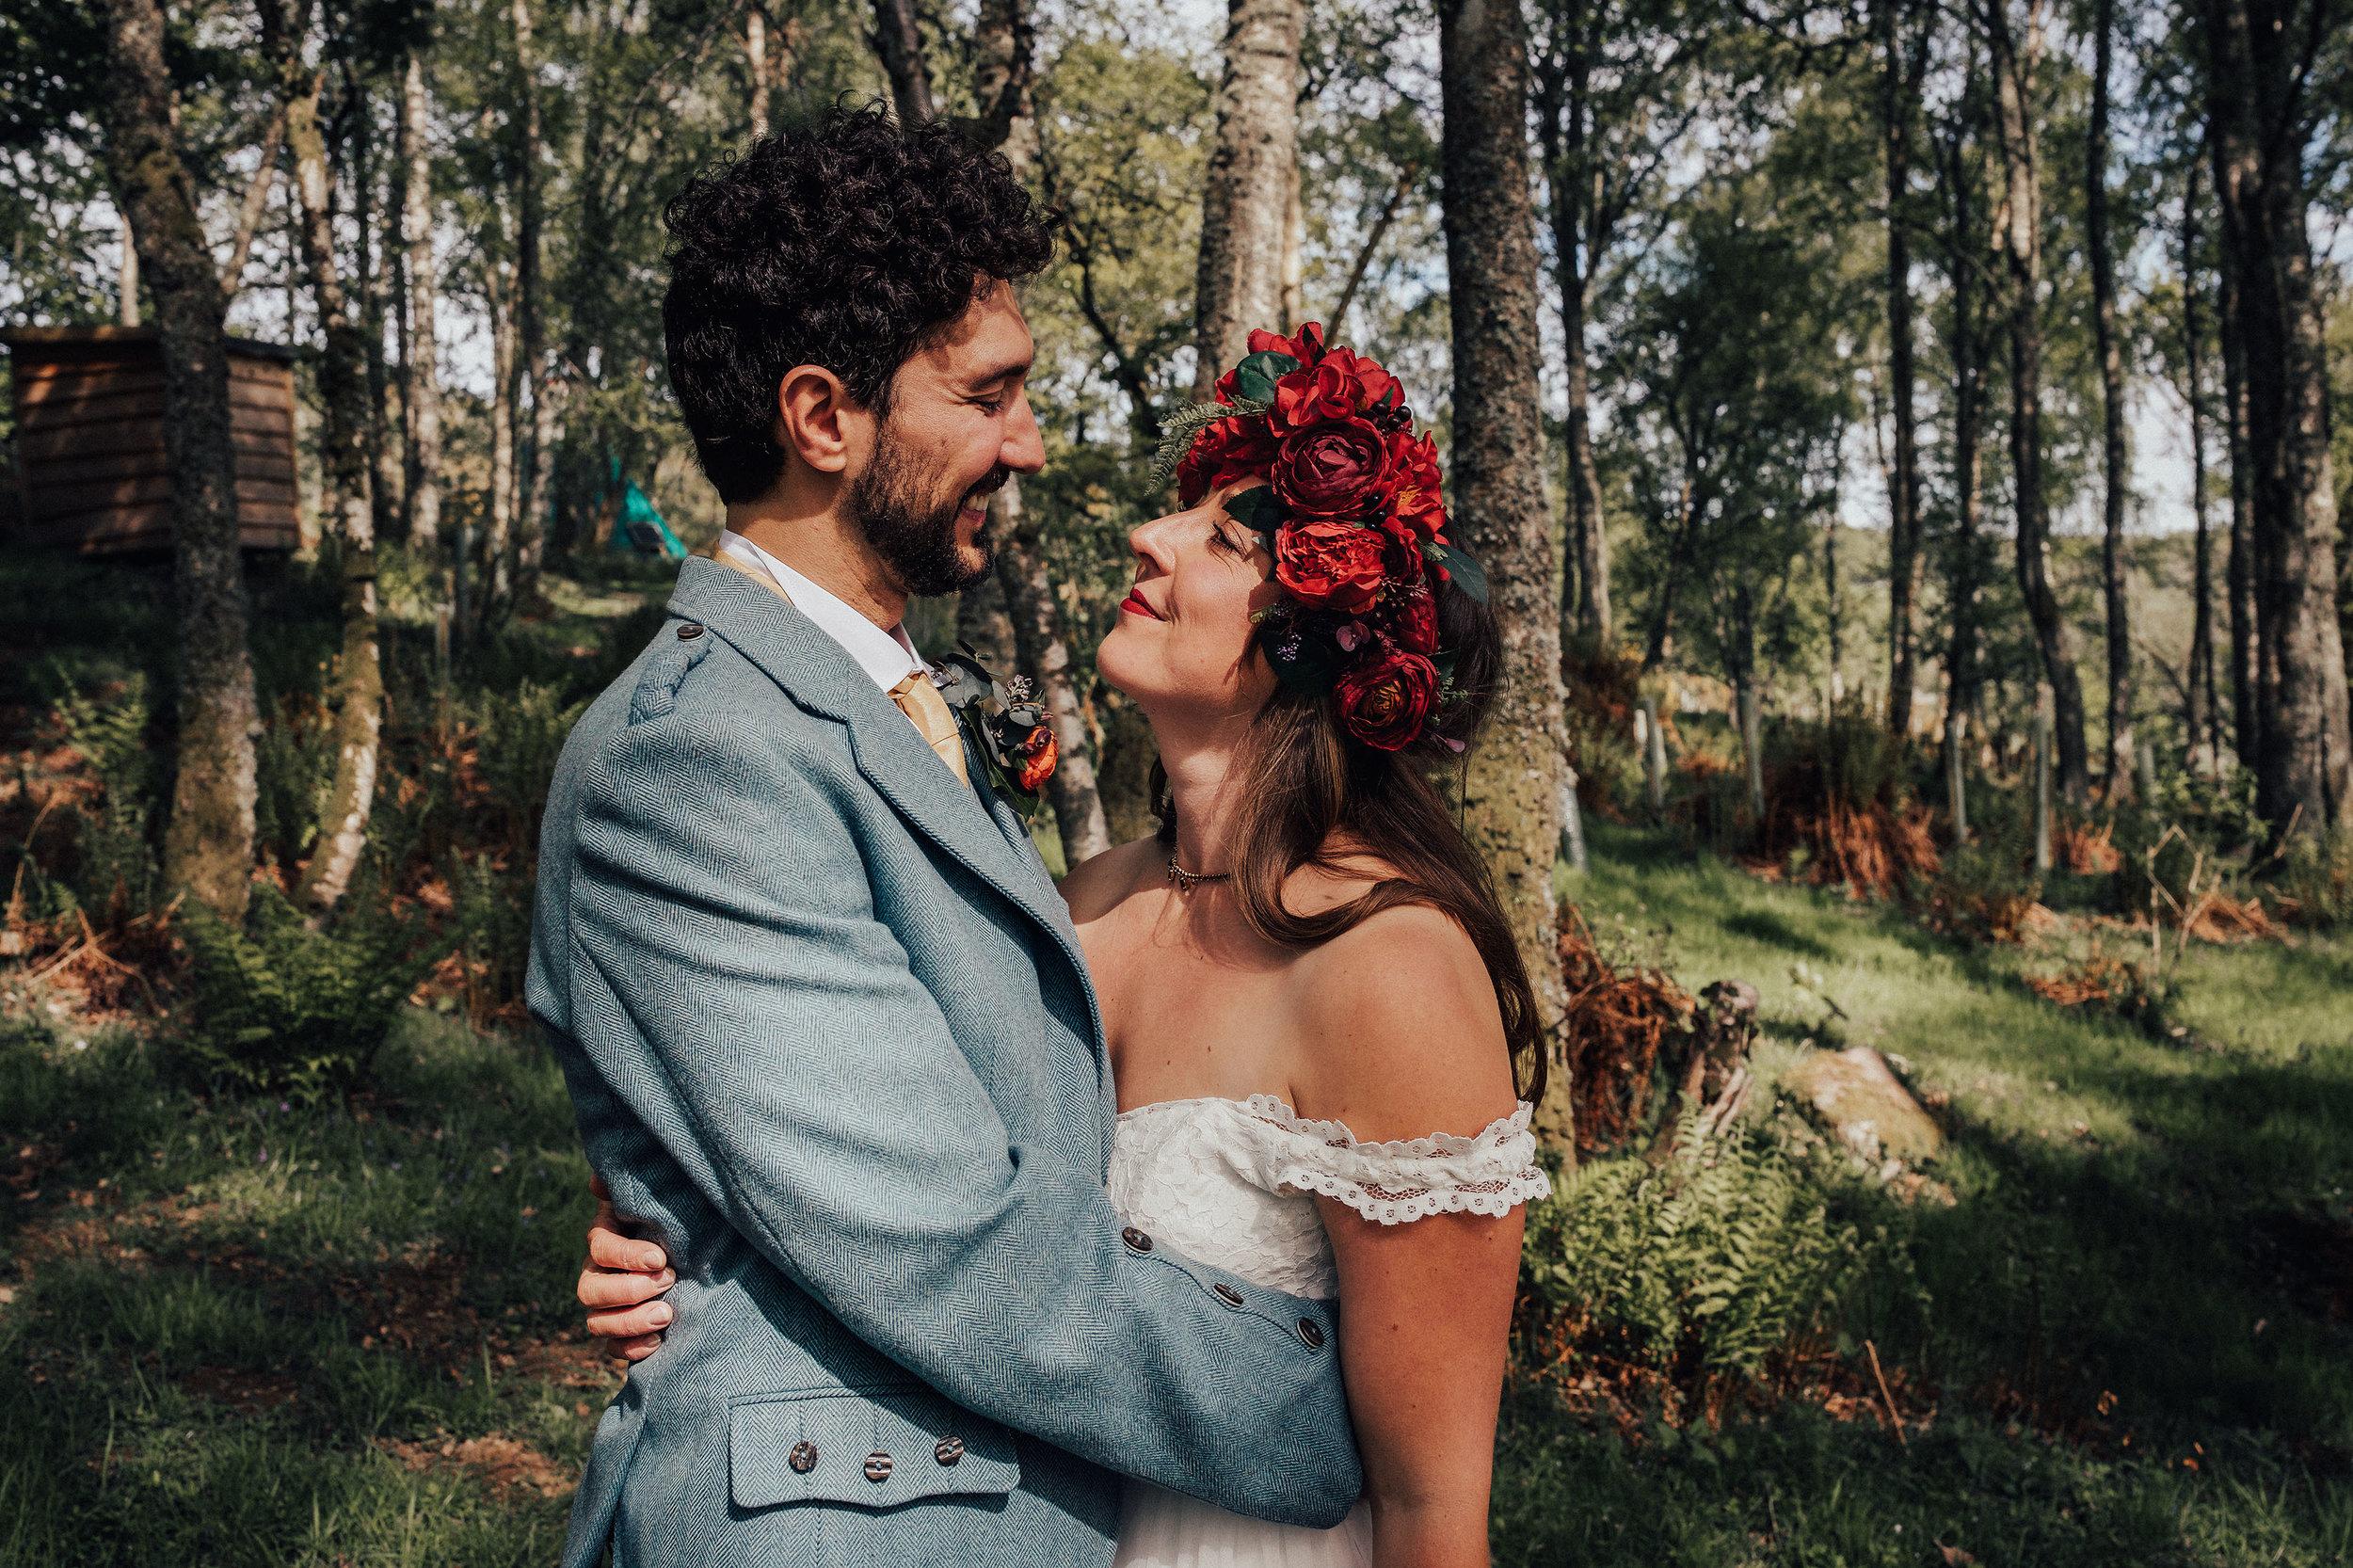 COMRIE_CROFT_WEDDINGS_PJ_PHILLIPS_PHOTOGRAPHY_102.jpg